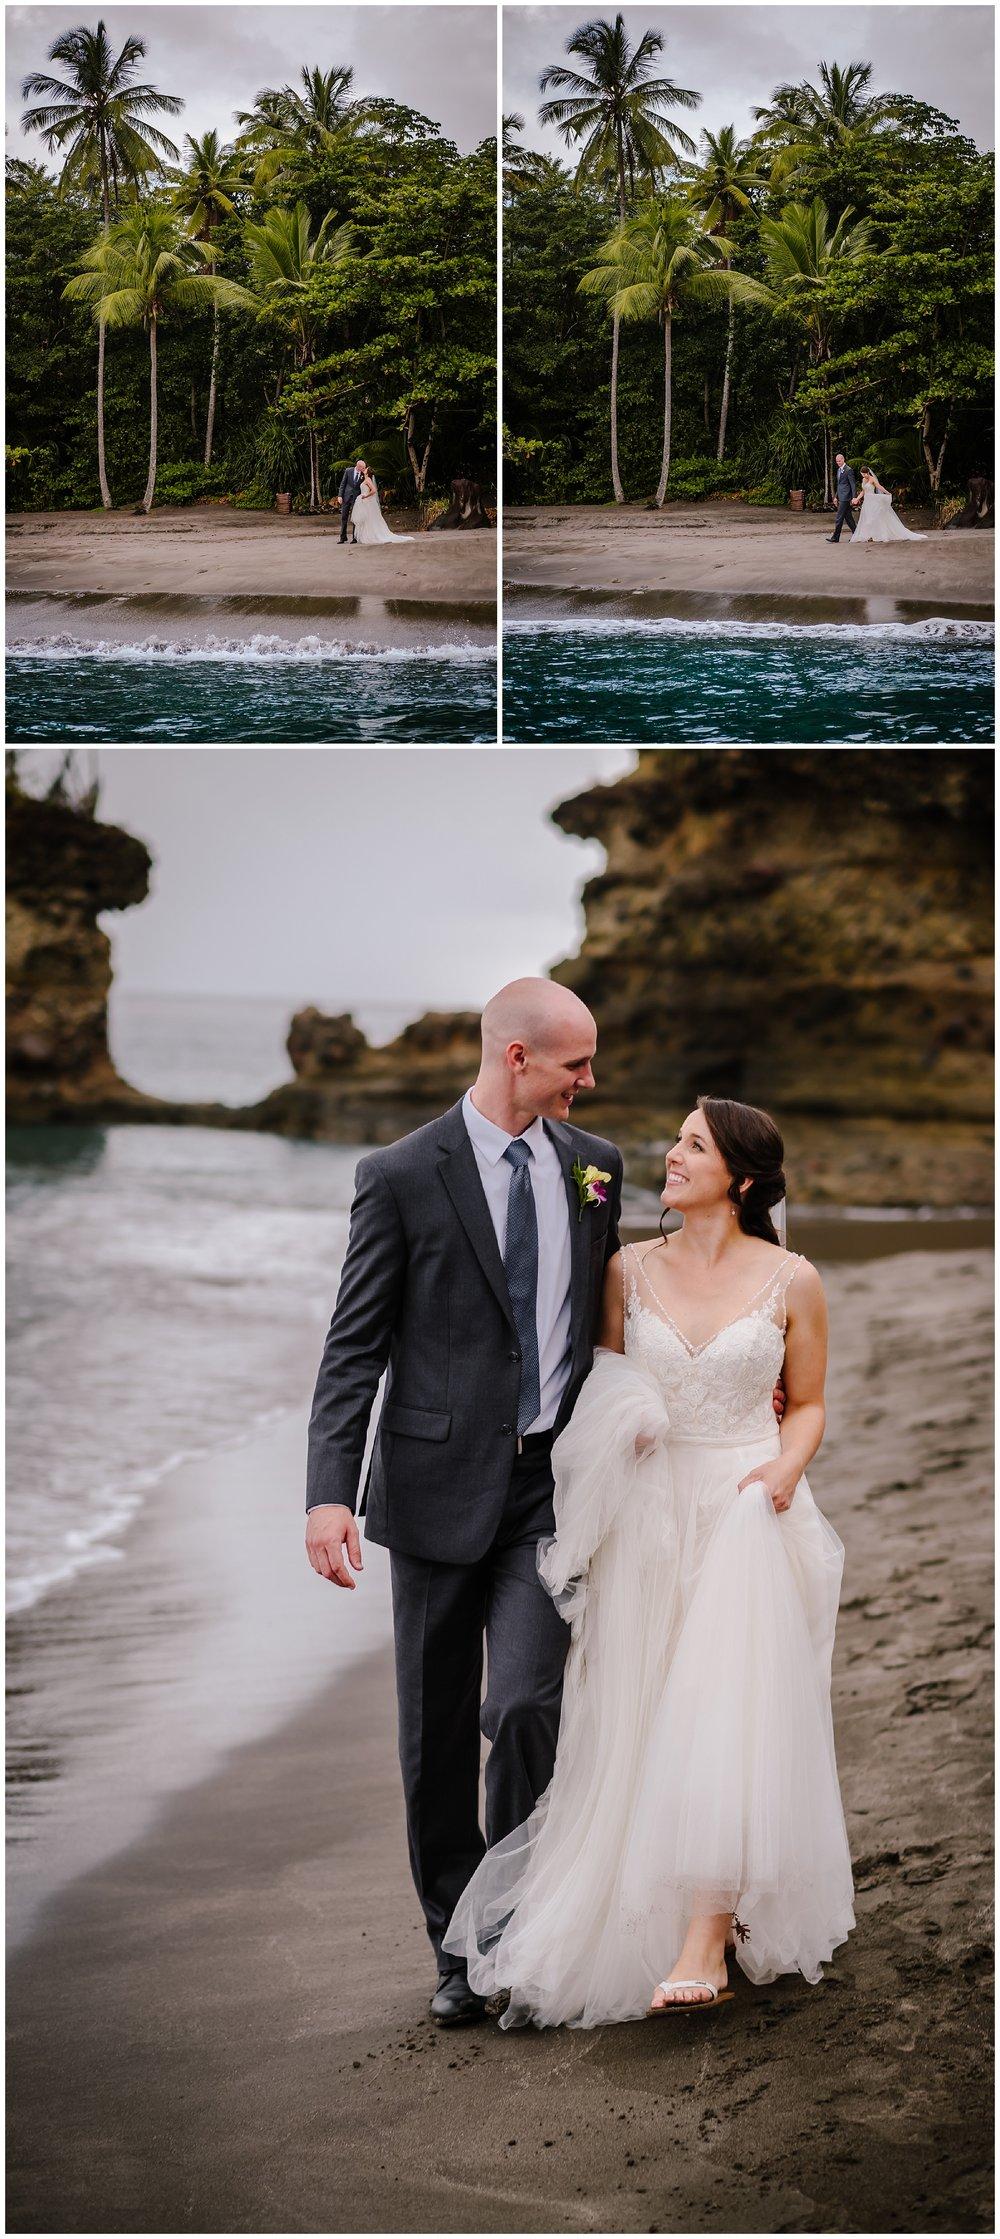 destination-wedding-photographer-st-lucia-black-sand-beaches_0070.jpg